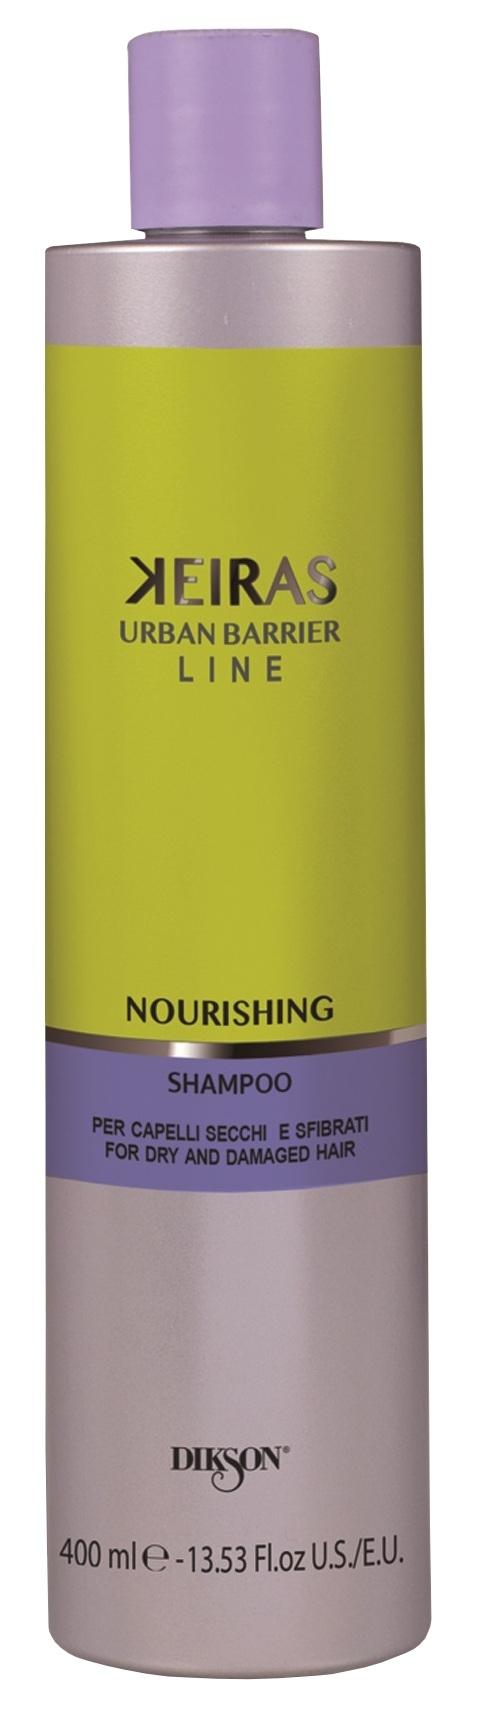 Dikson Шампунь Shampoo for Dry and Damaged Hair для Поврежденных Волос, 400 мл цена и фото